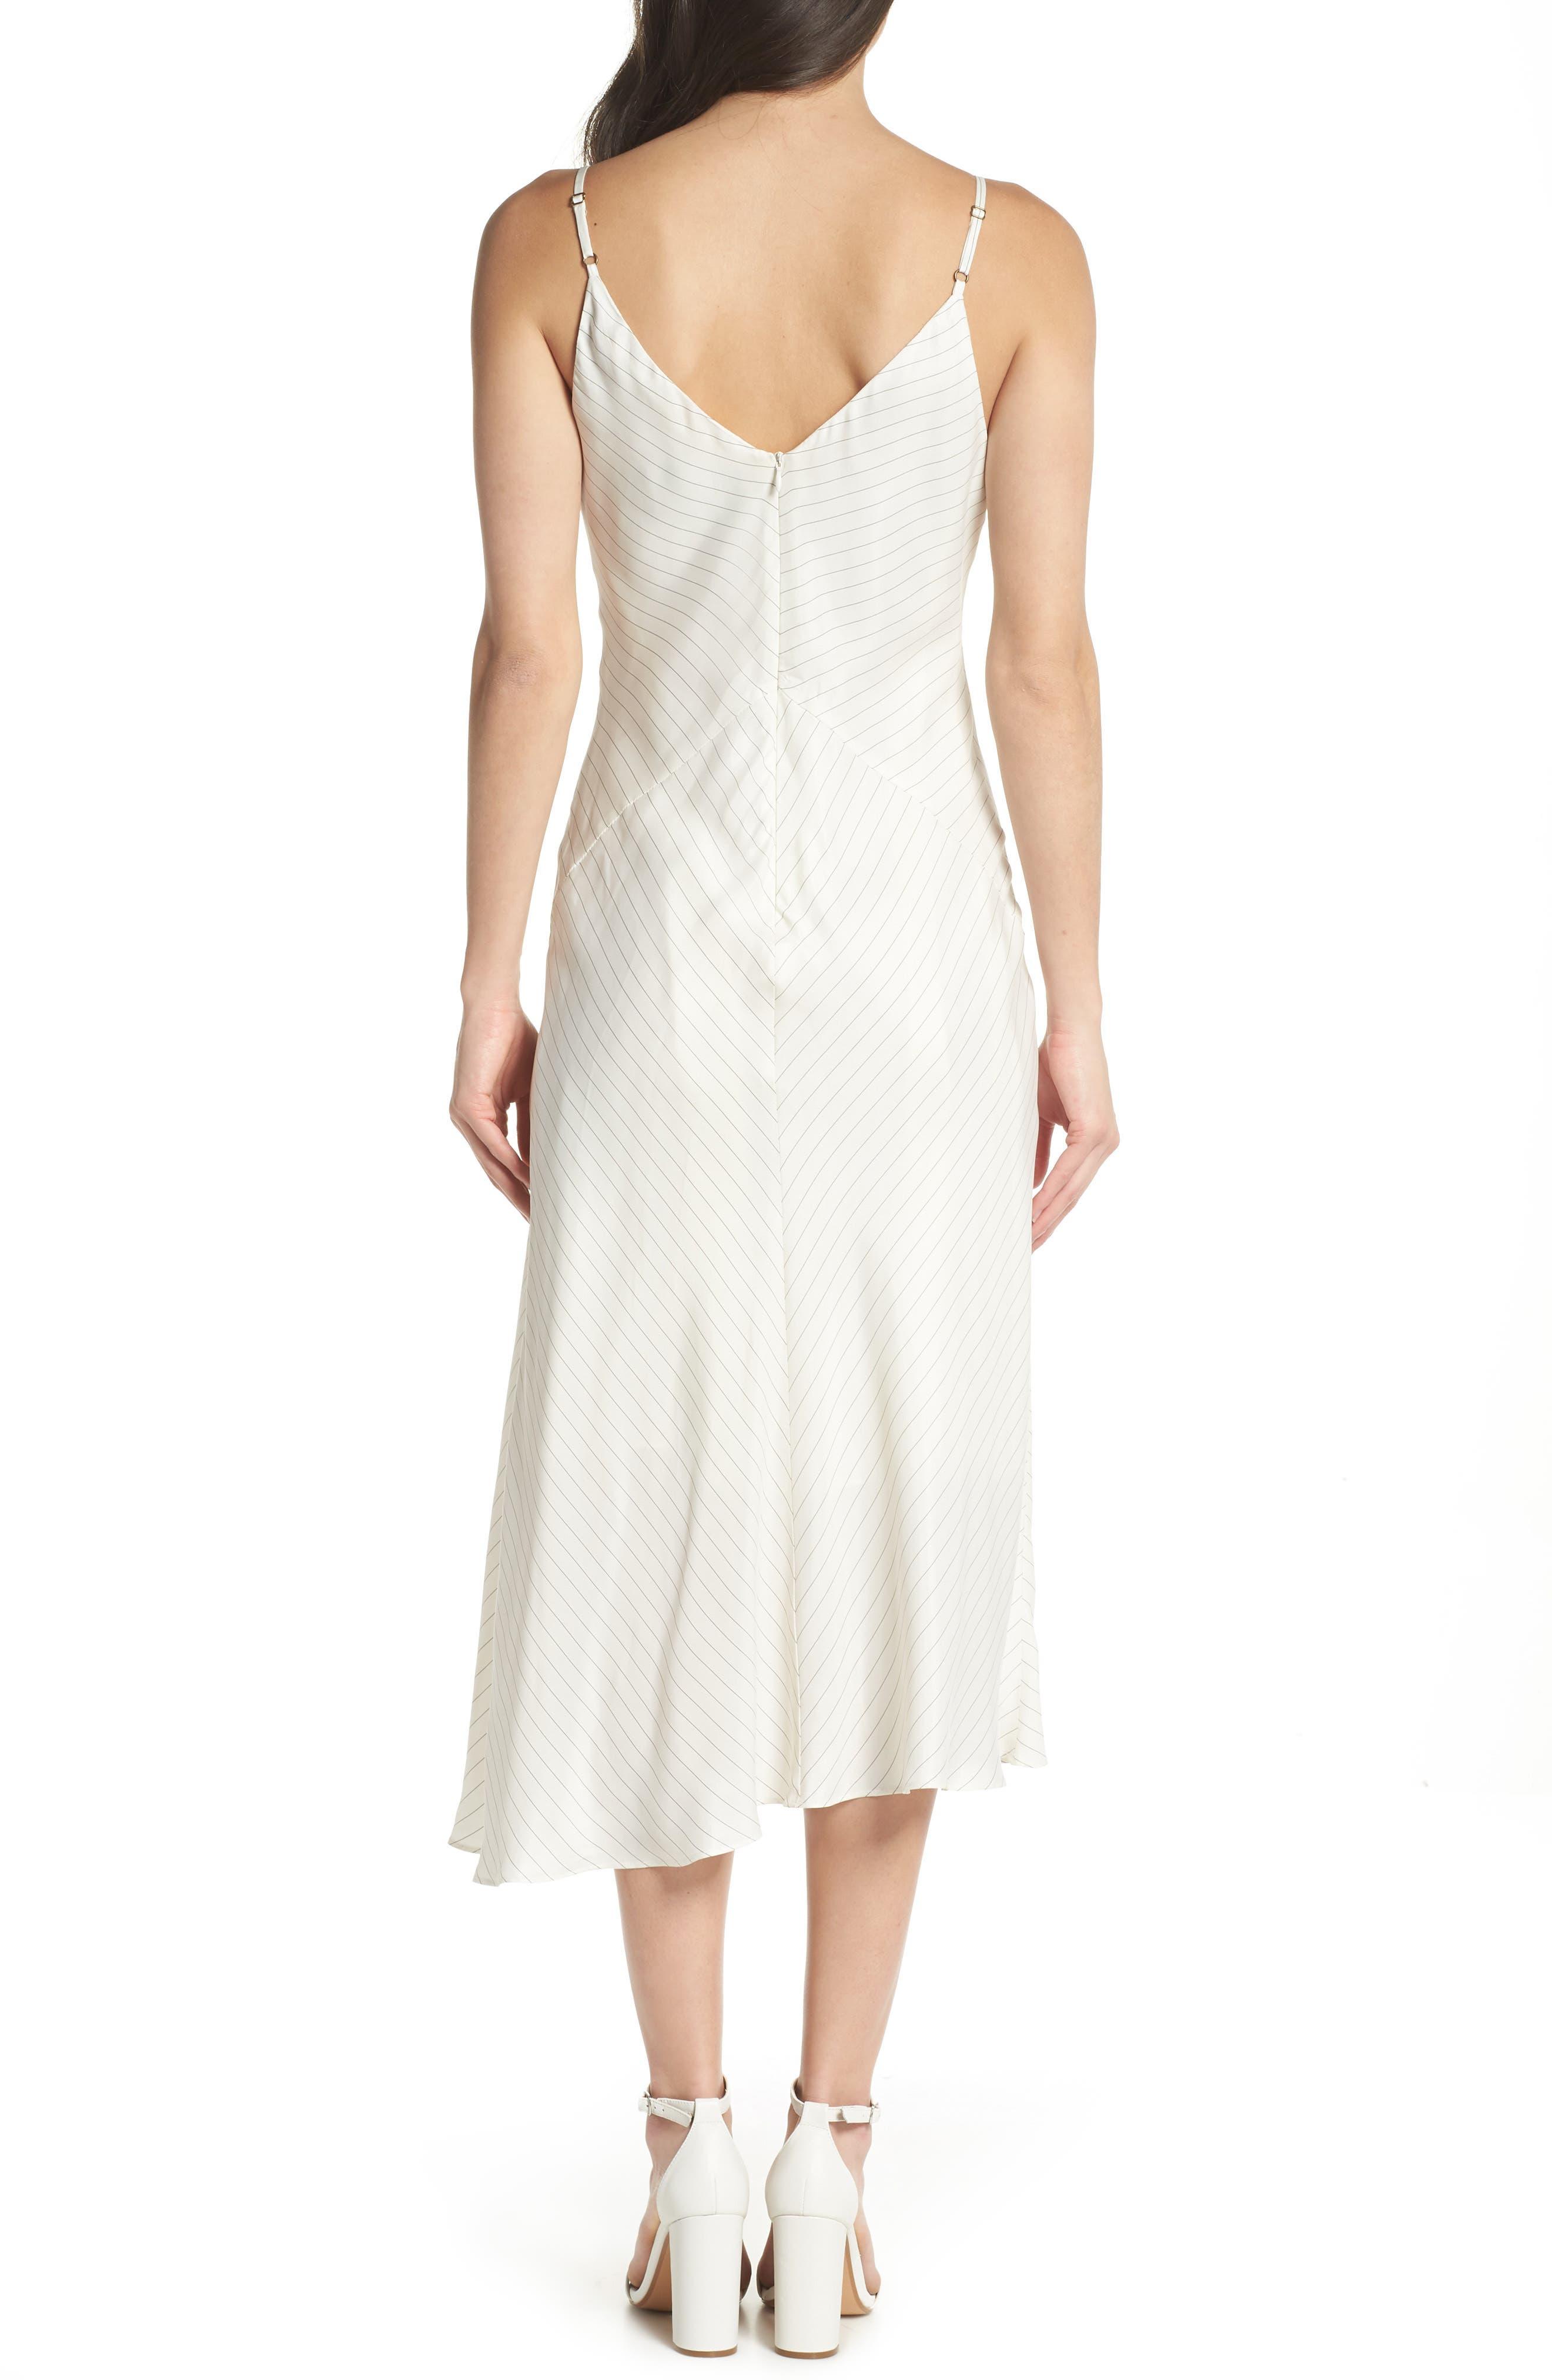 Bay Area Pinstripe Asymmetric Midi Dress,                             Alternate thumbnail 2, color,                             105